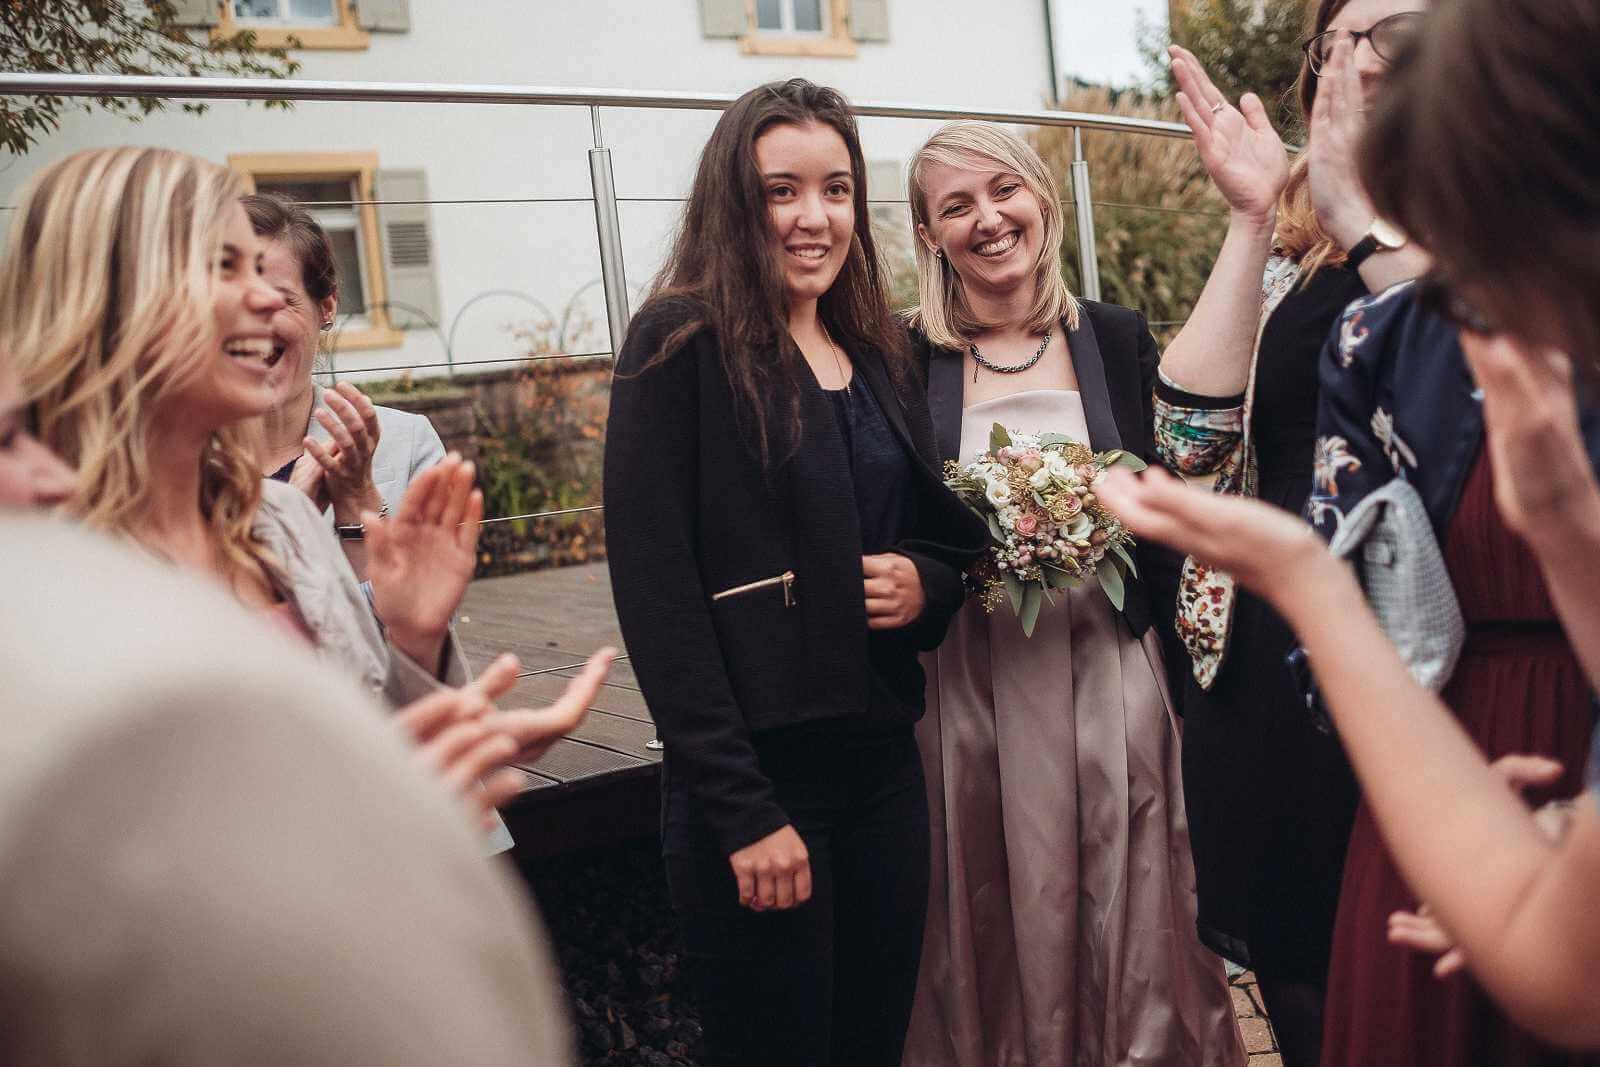 Hochzeitsfotograf Offenburg Zell am Harmersbach Bärenkeller (57)